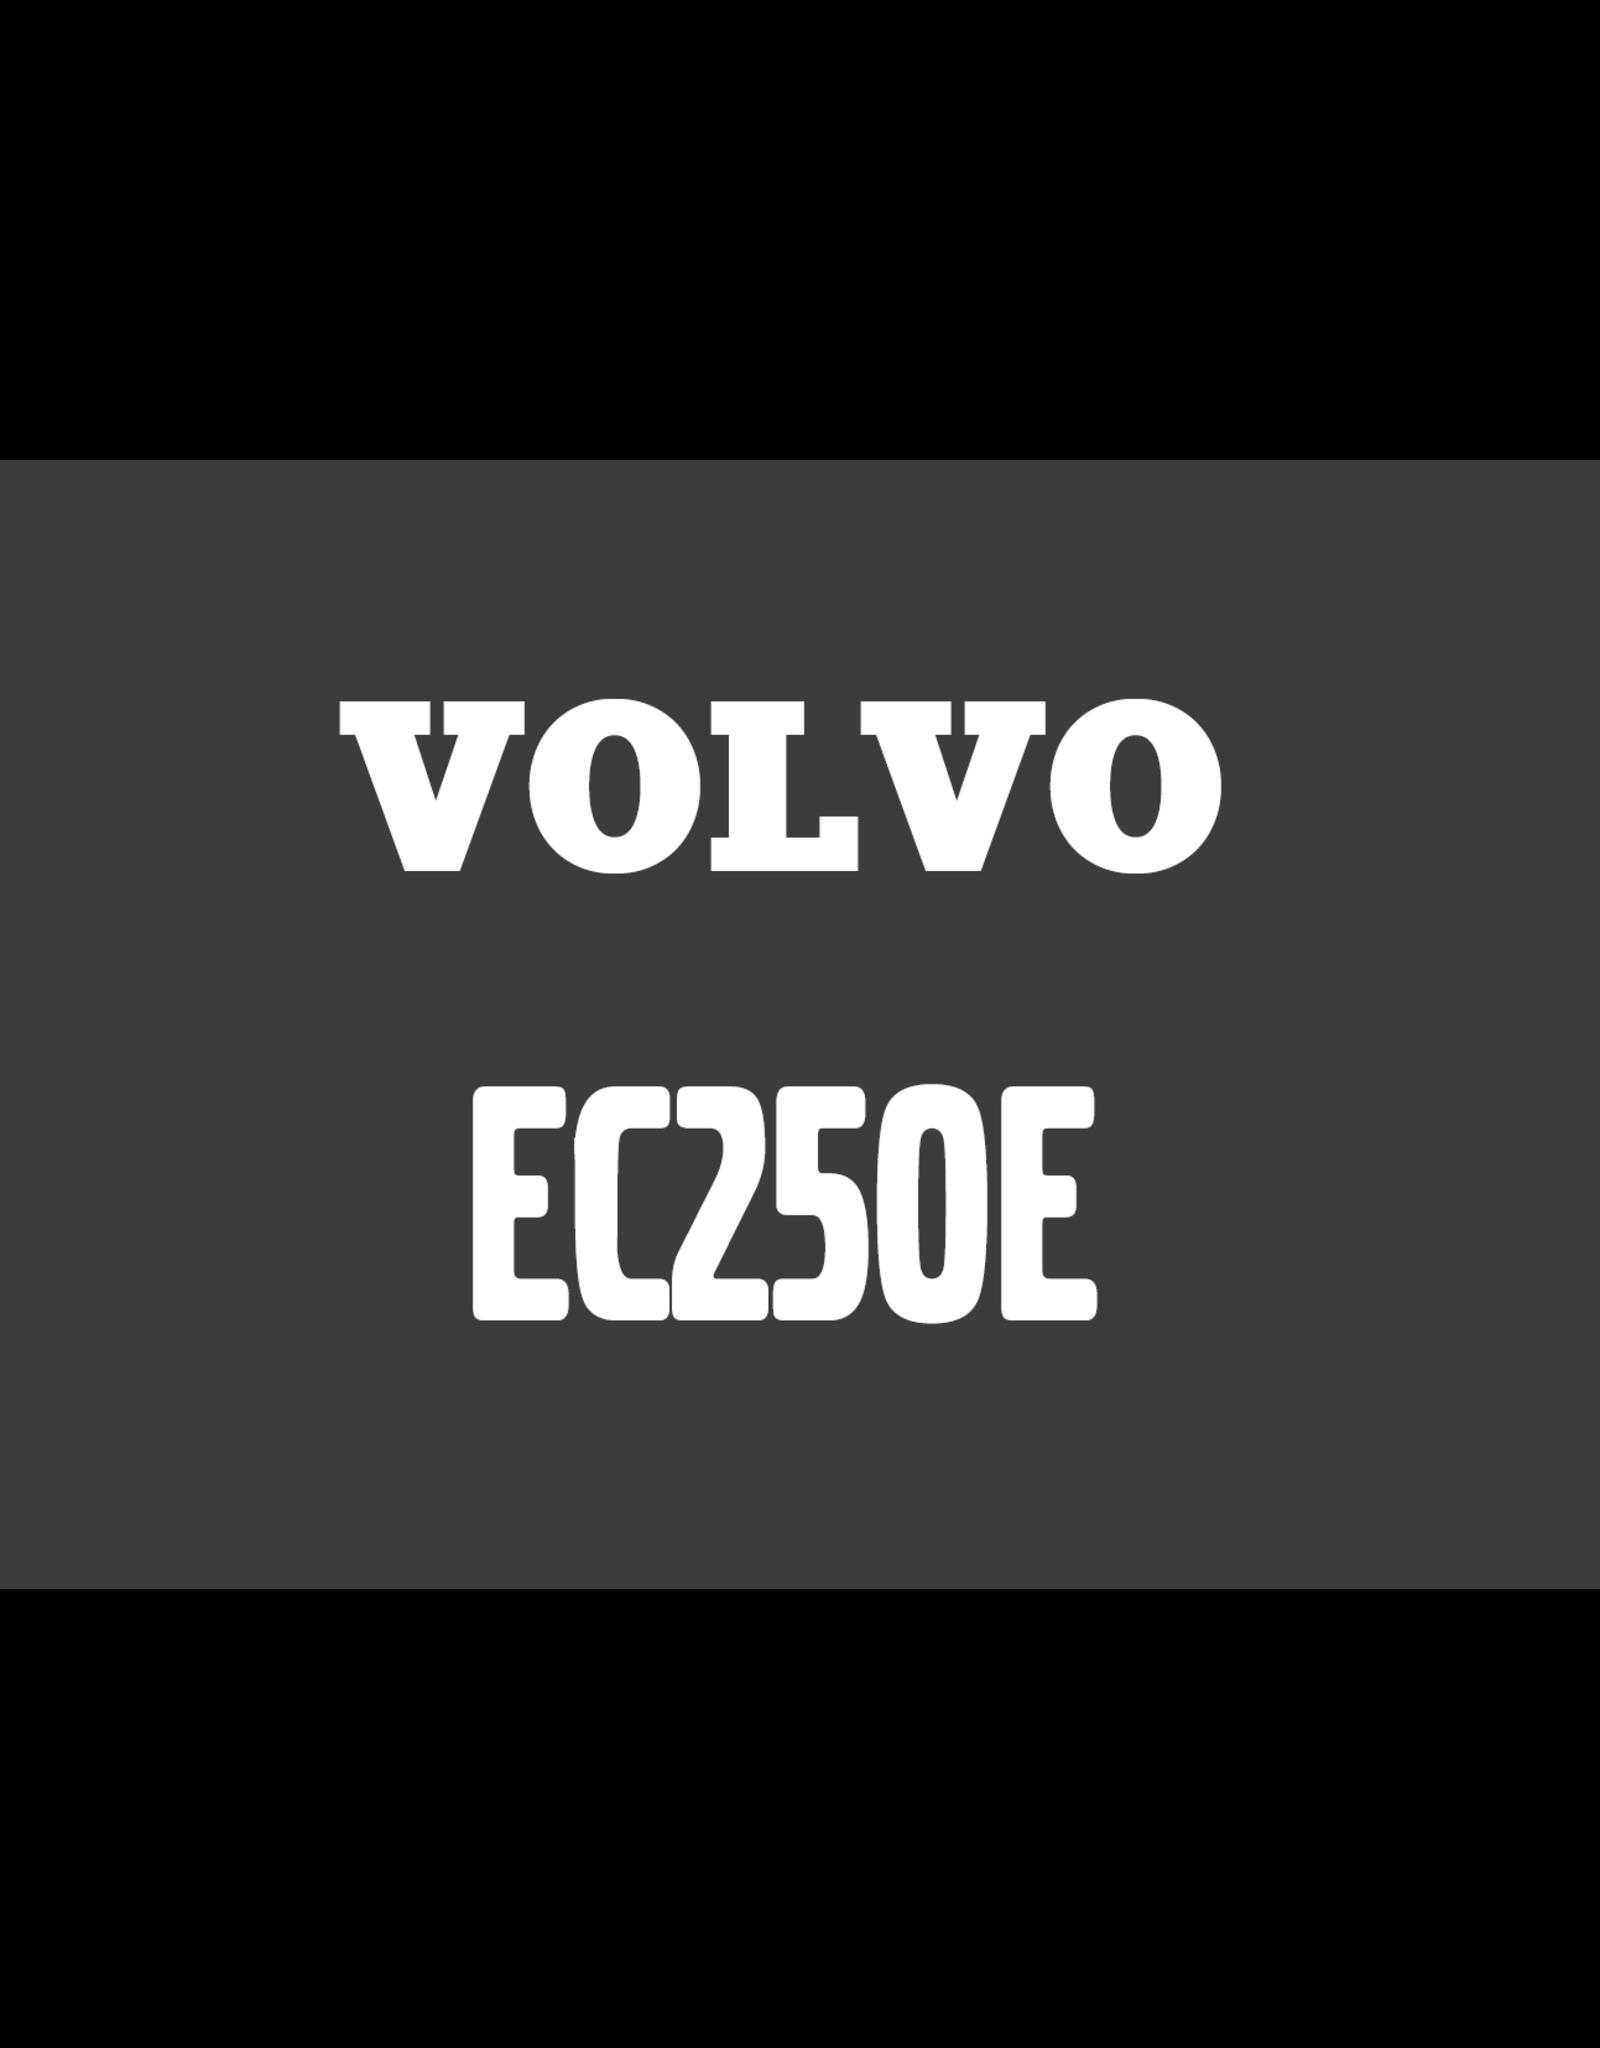 Echle Hartstahl GmbH FOPS für Volvo EC250E